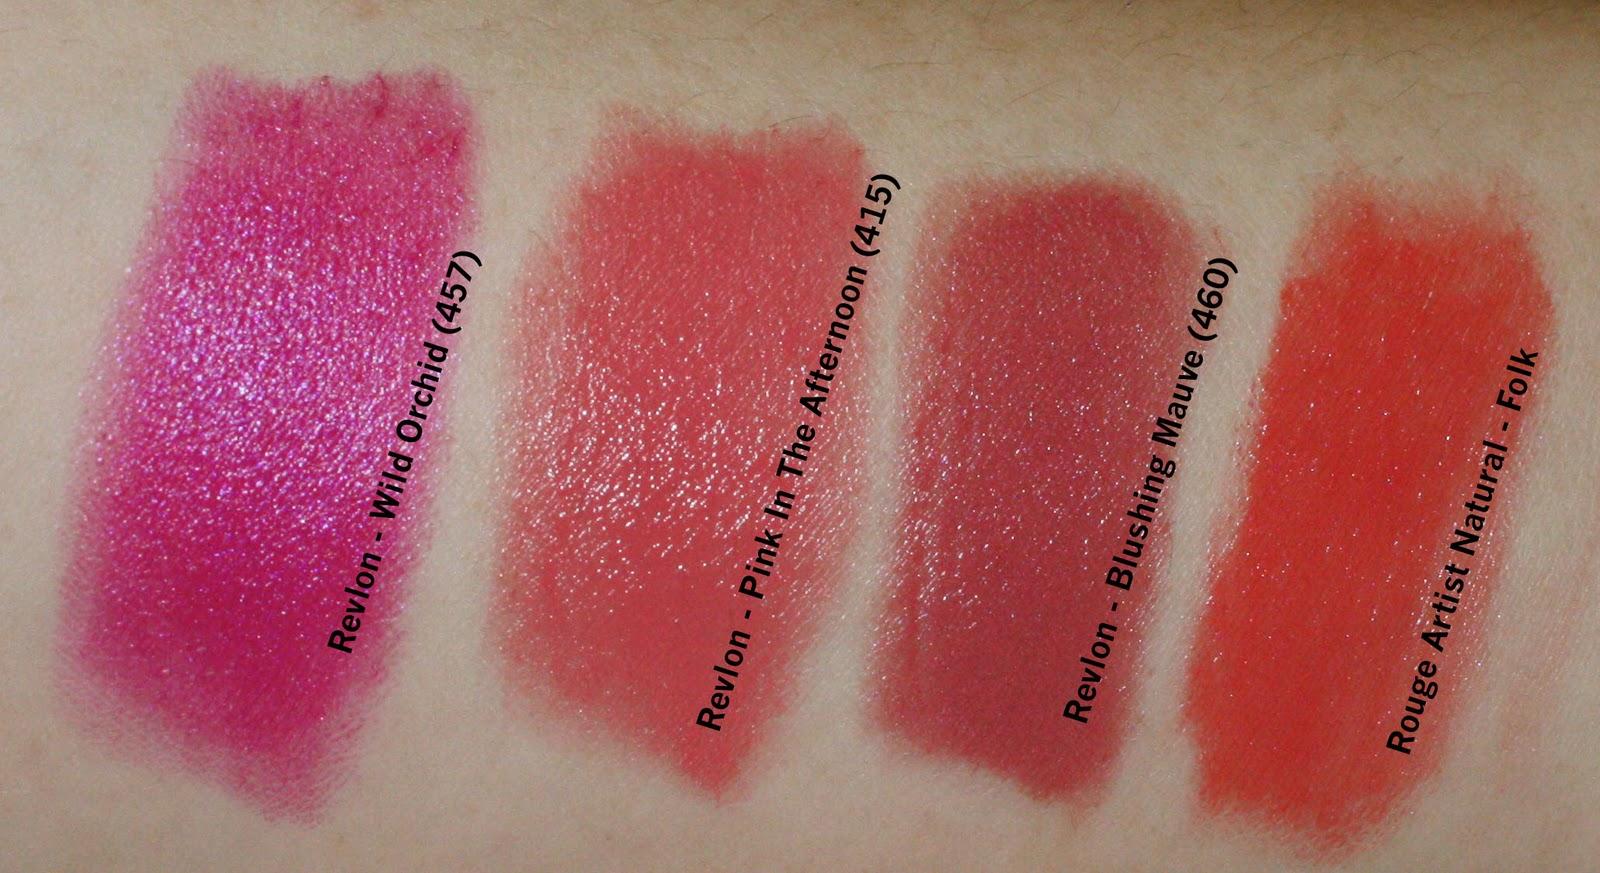 Revlon Mauve Lipstick 158 lipstick collection  iRevlon Mystic Mauve Lipstick